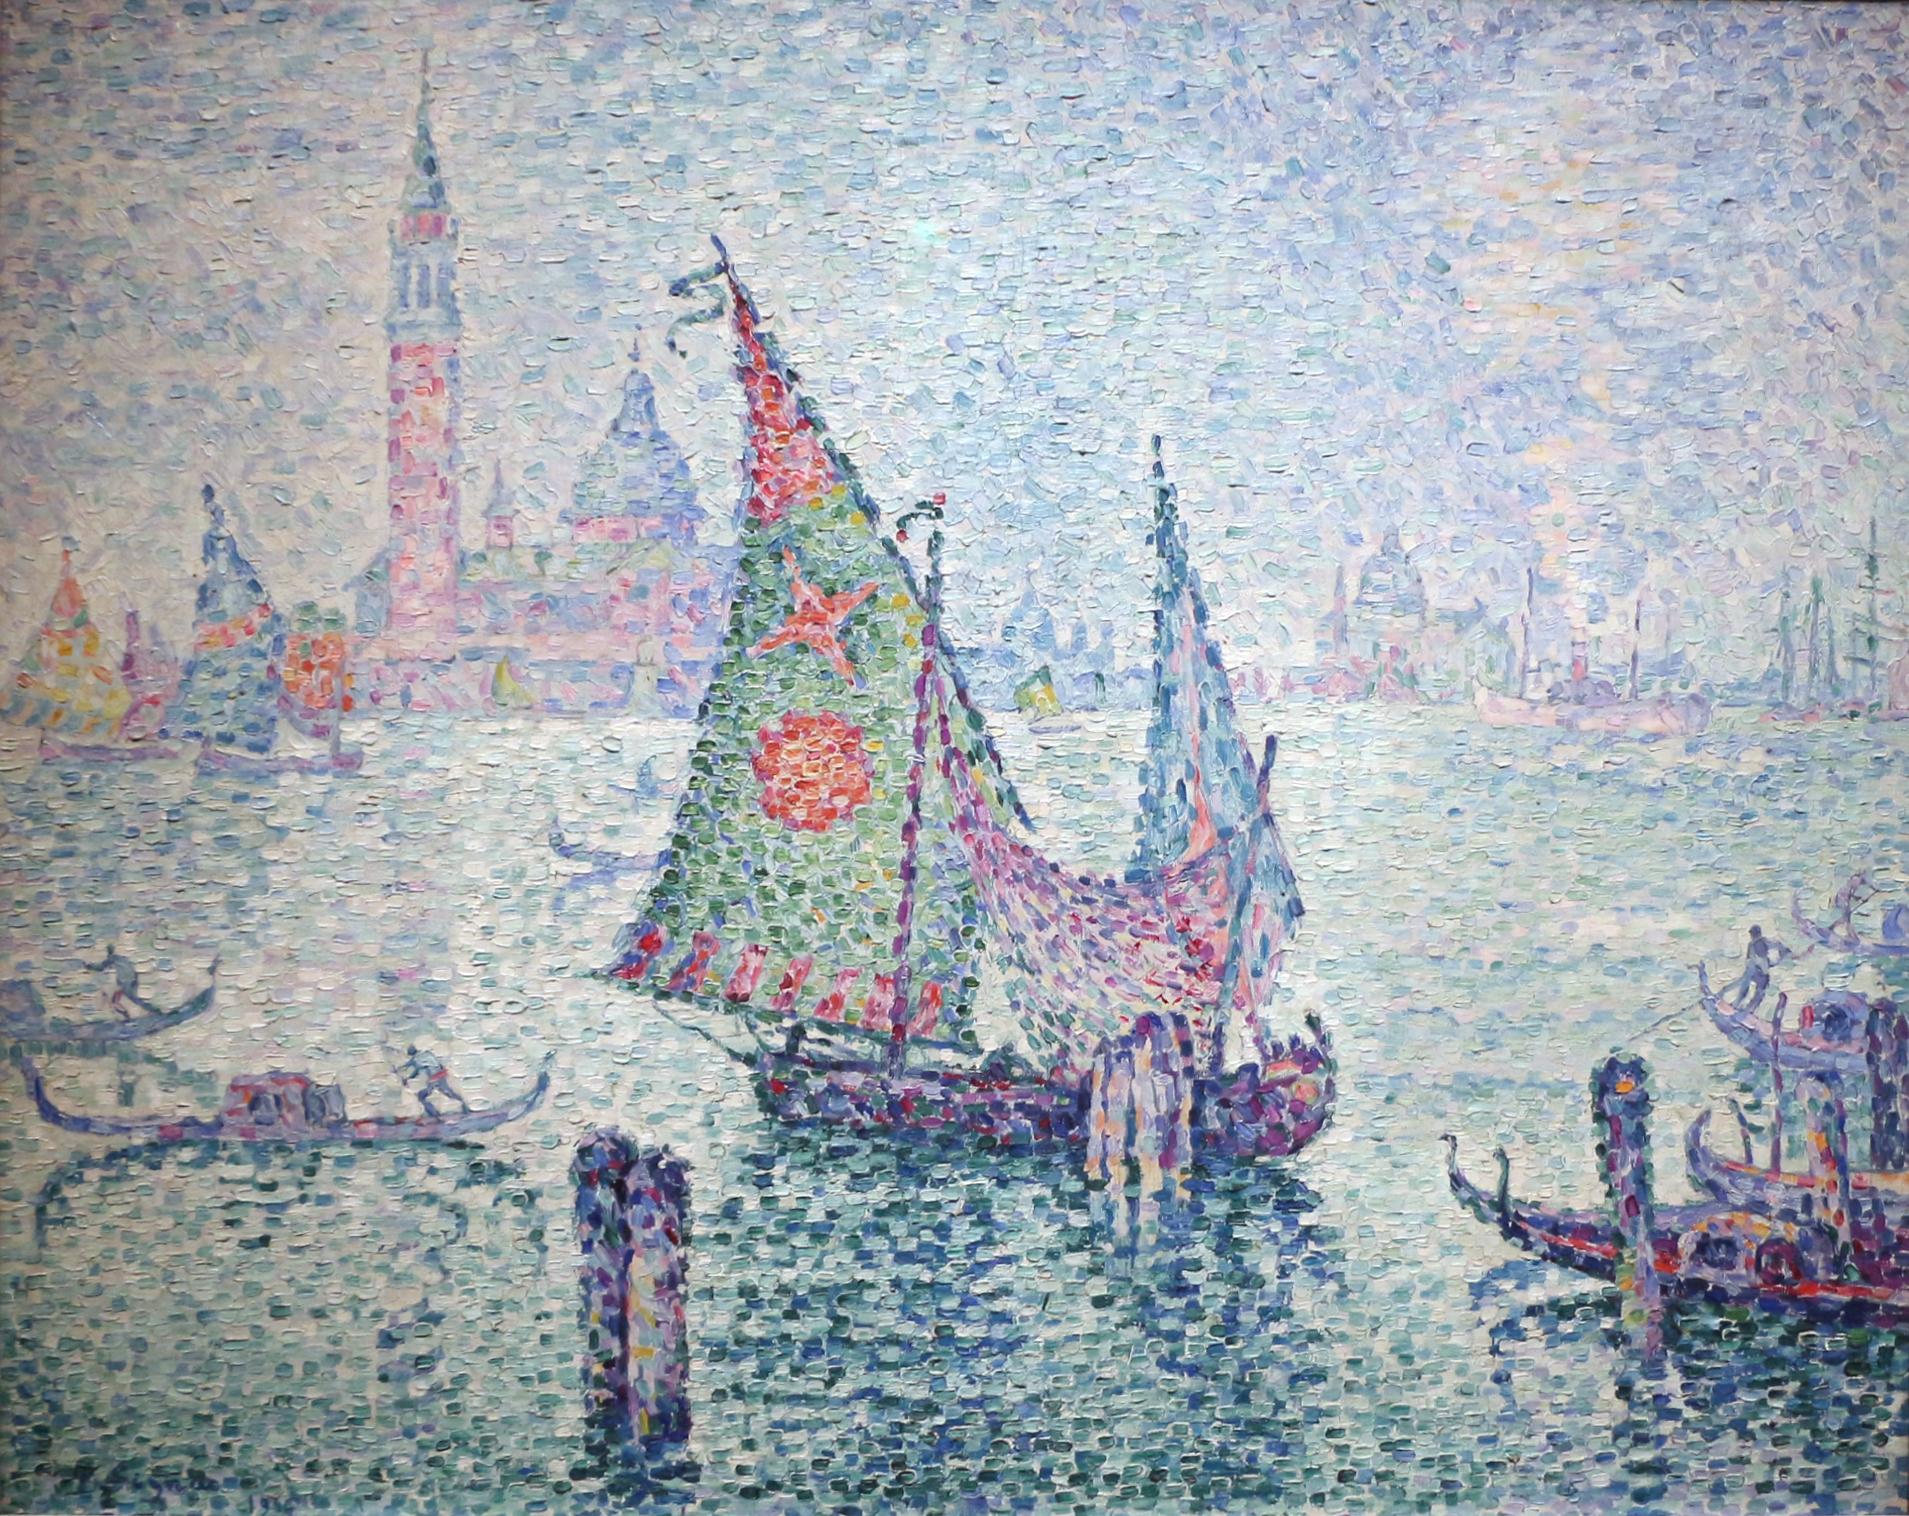 Paul_signac,_la_barca_a_vela_verde,_1904